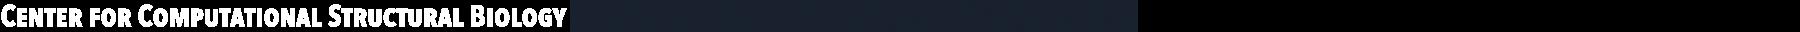 AutoDock Vina Logo